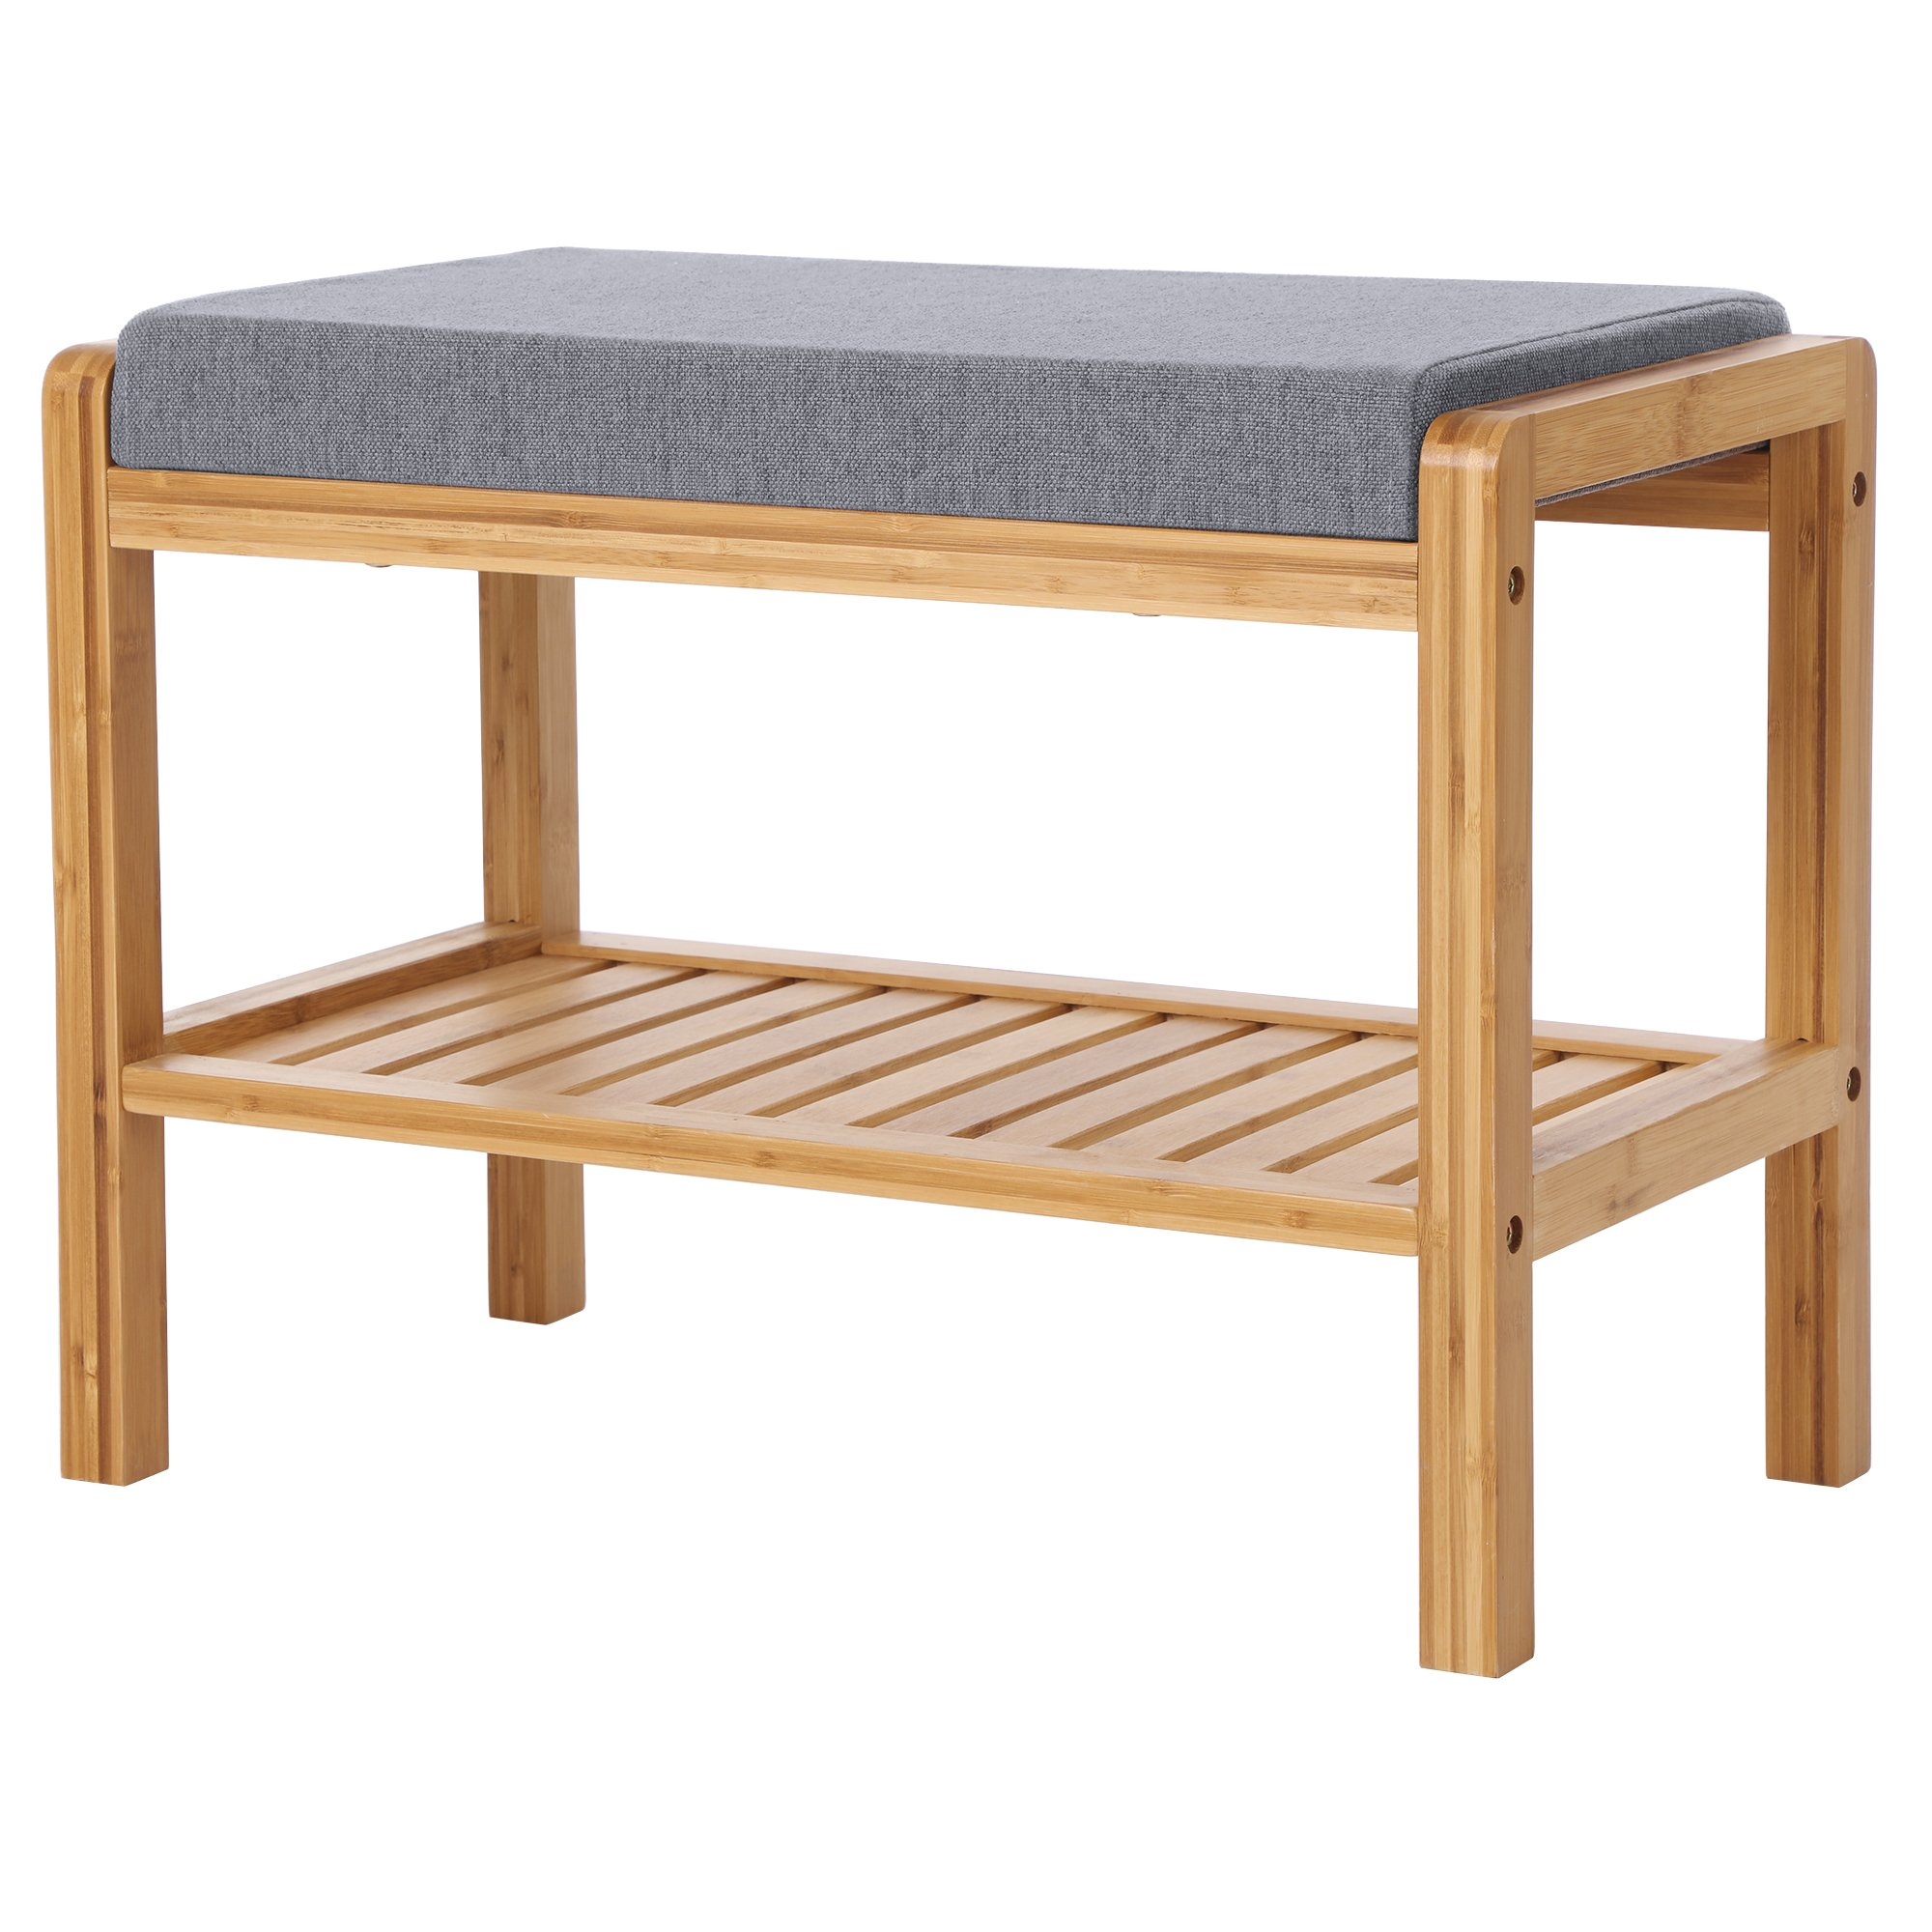 SONGMICS Bamboo Shoe Bench Rack with Upholstered Padded Seat Storage Shelf Origanizer Bench for Bedroom Living Room Hallway Front Door Entryway Foyer Garage Natural ULBS65N